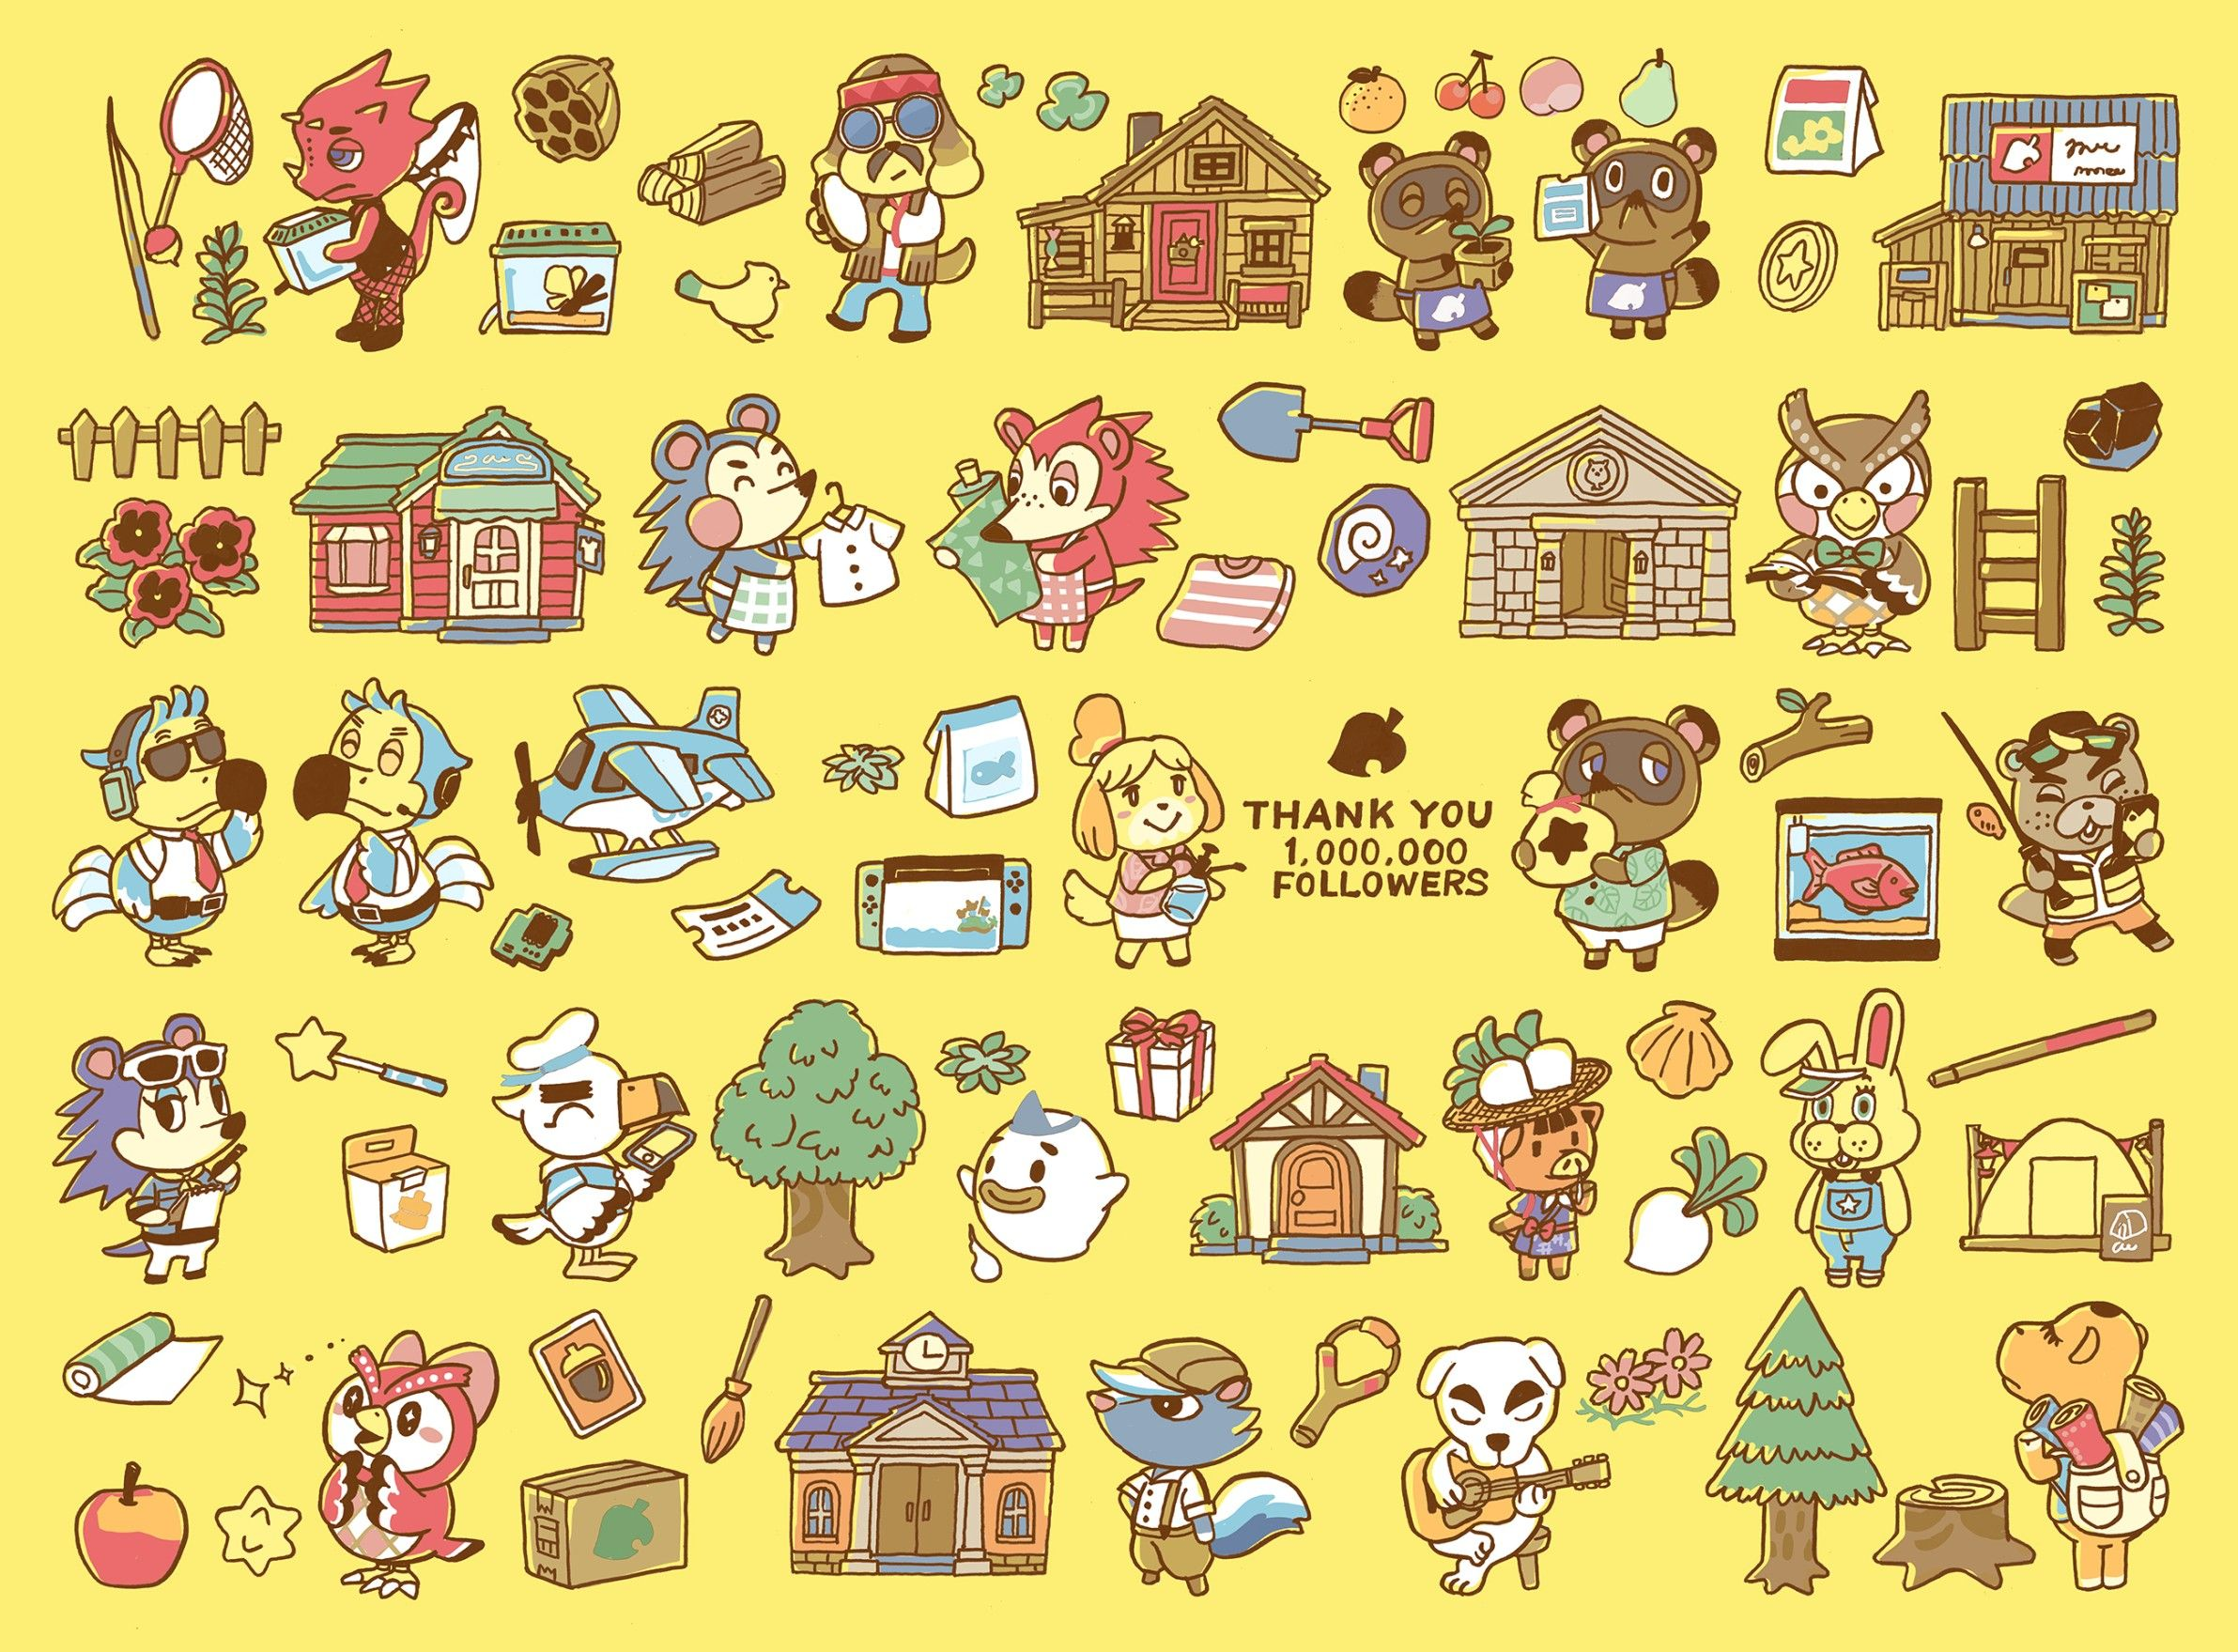 Kawaii Animal Crossing Wallpapers - Wallpaper Cave